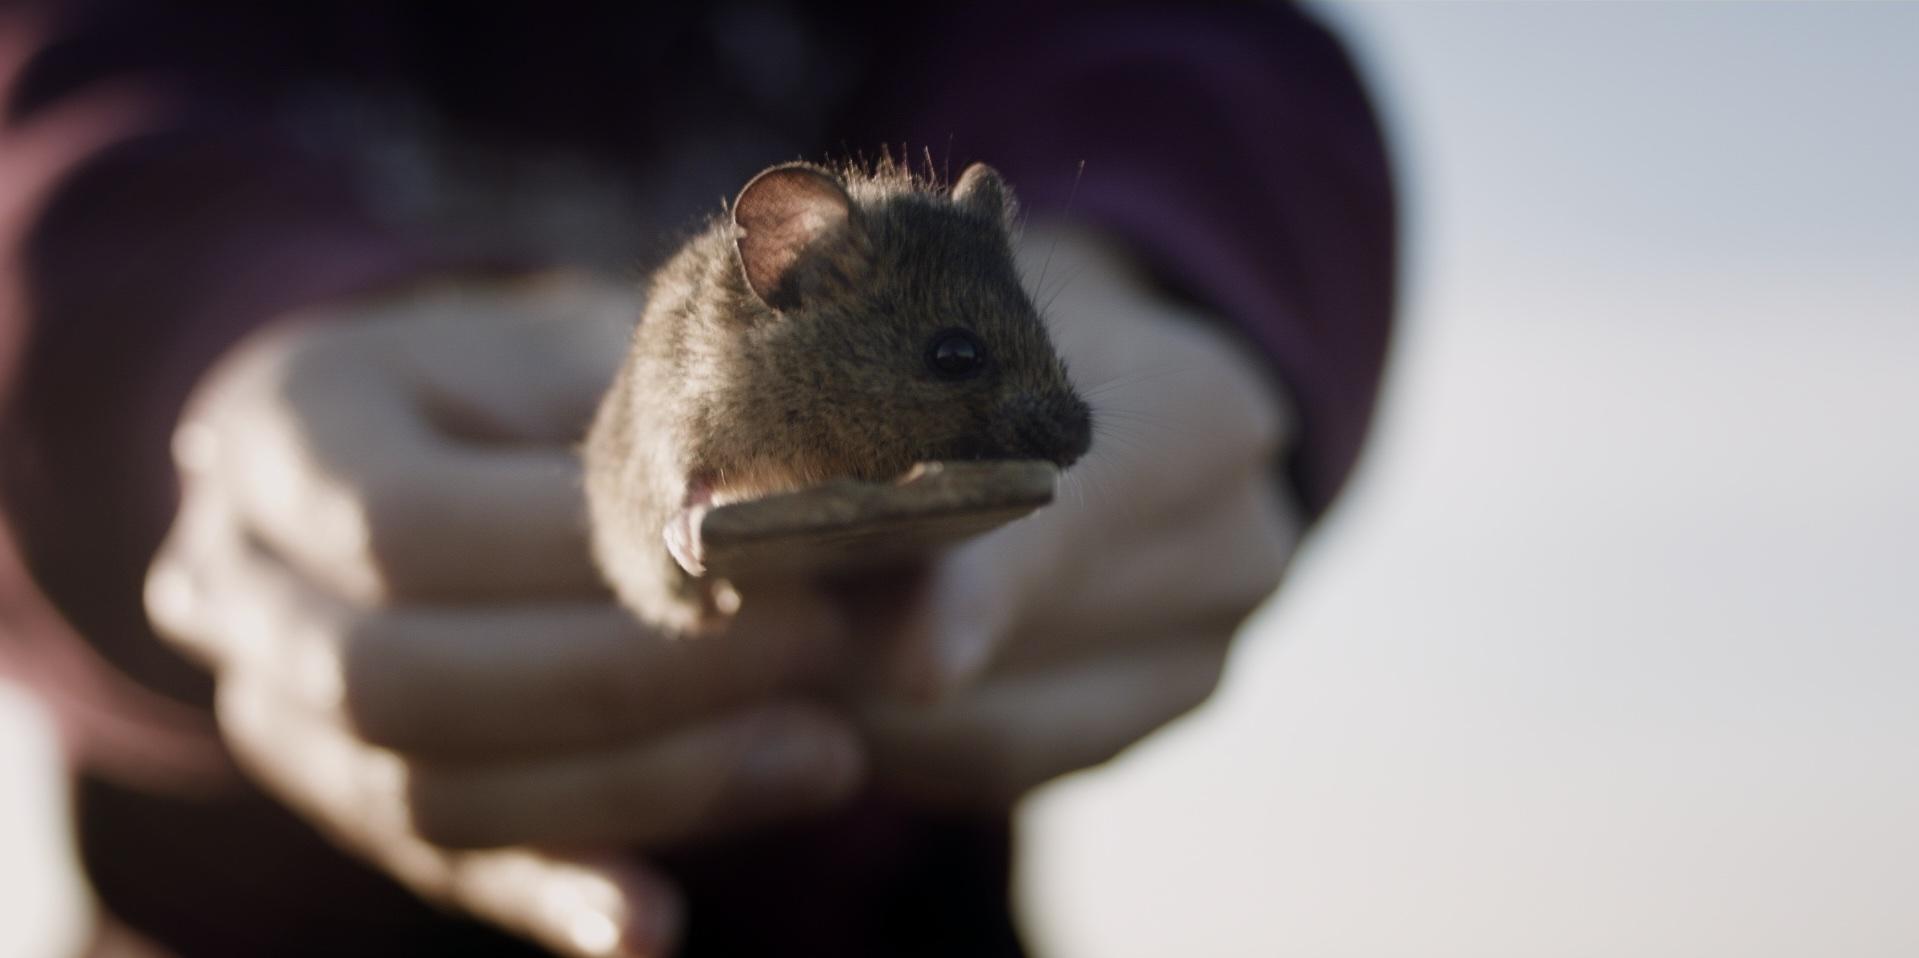 mice_1.57.3.jpg